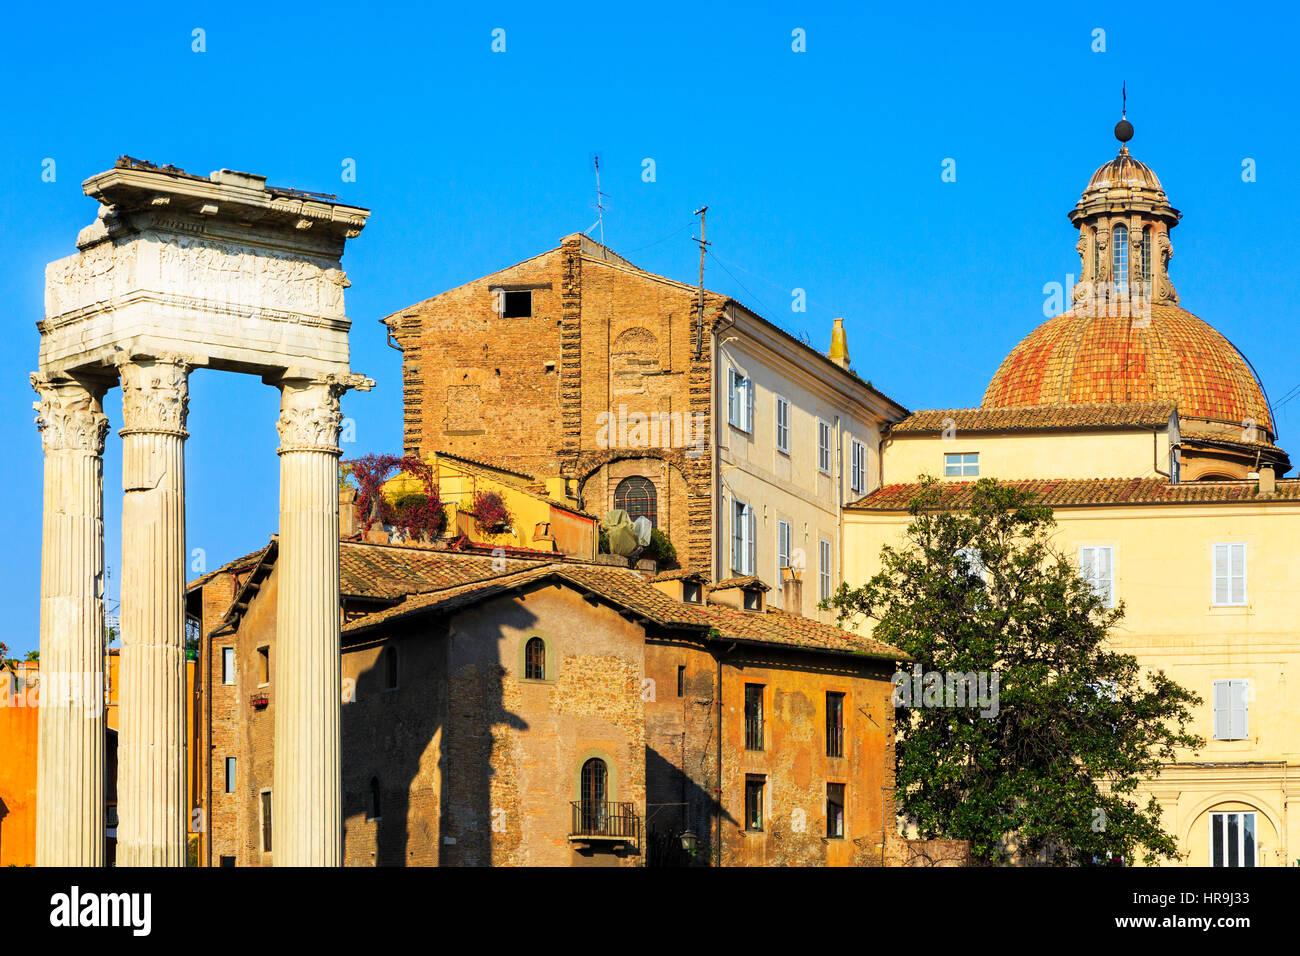 Detalles del edificio antiguo con pilares romanos en Via San Marco, Roma, Italia Imagen De Stock